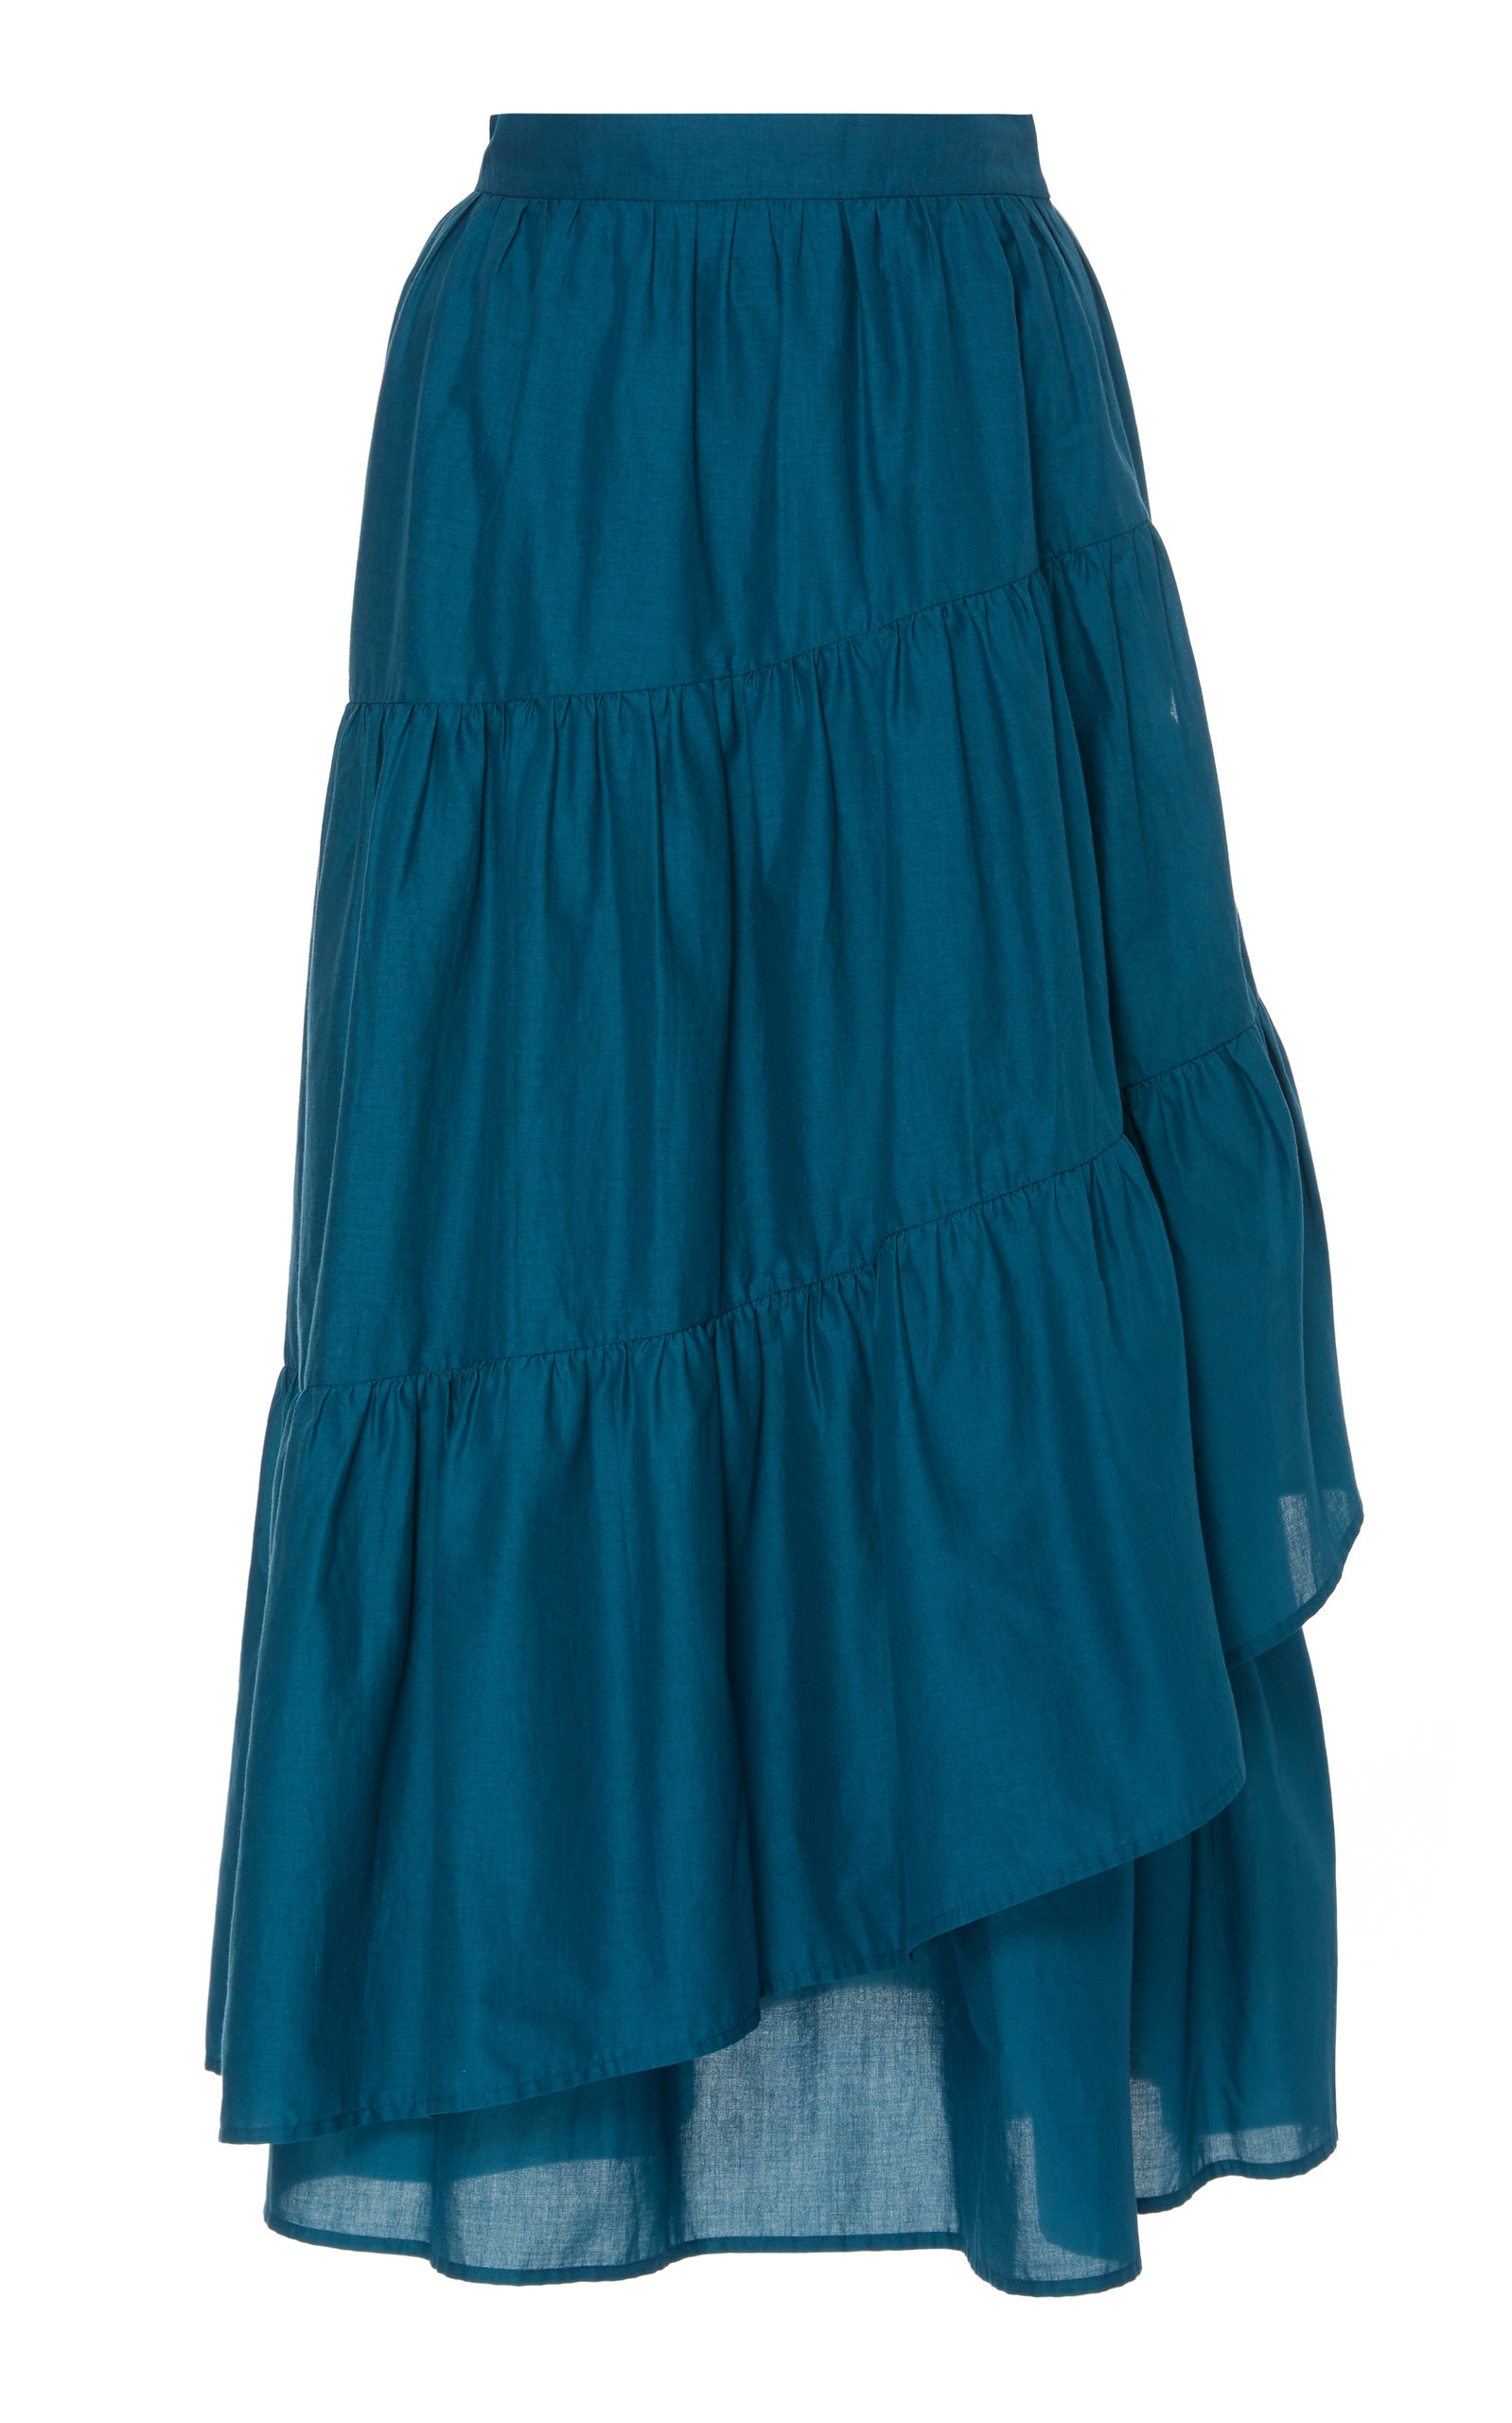 52b26cd0cc6860 Hallerbos Cotton Maxi Skirt by Merlette   Moda Operandi